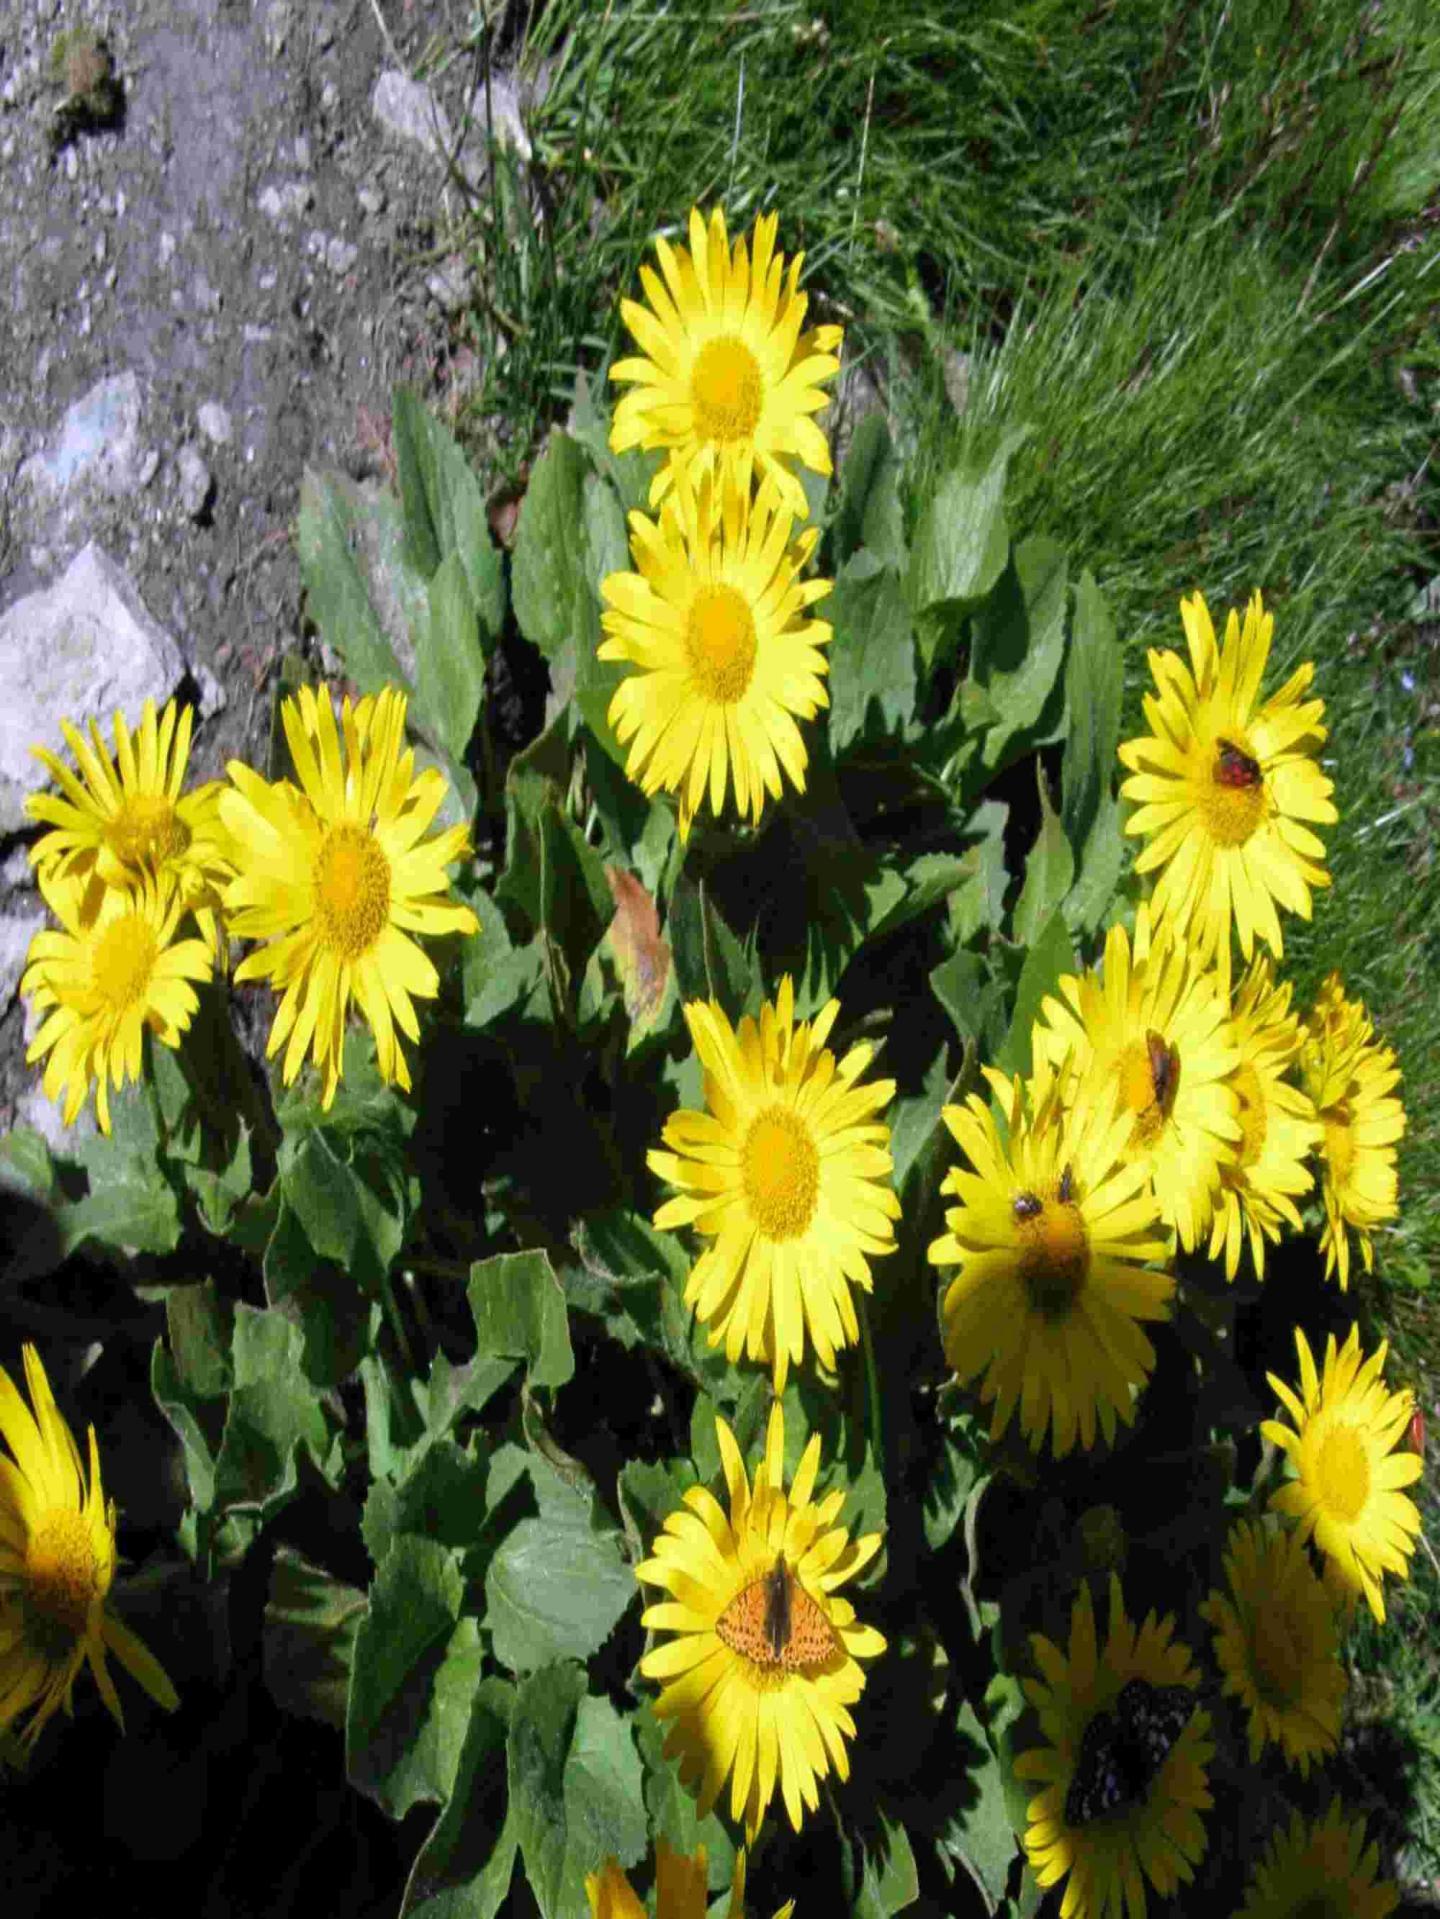 Doronics grandes fleurs 2887285589 o